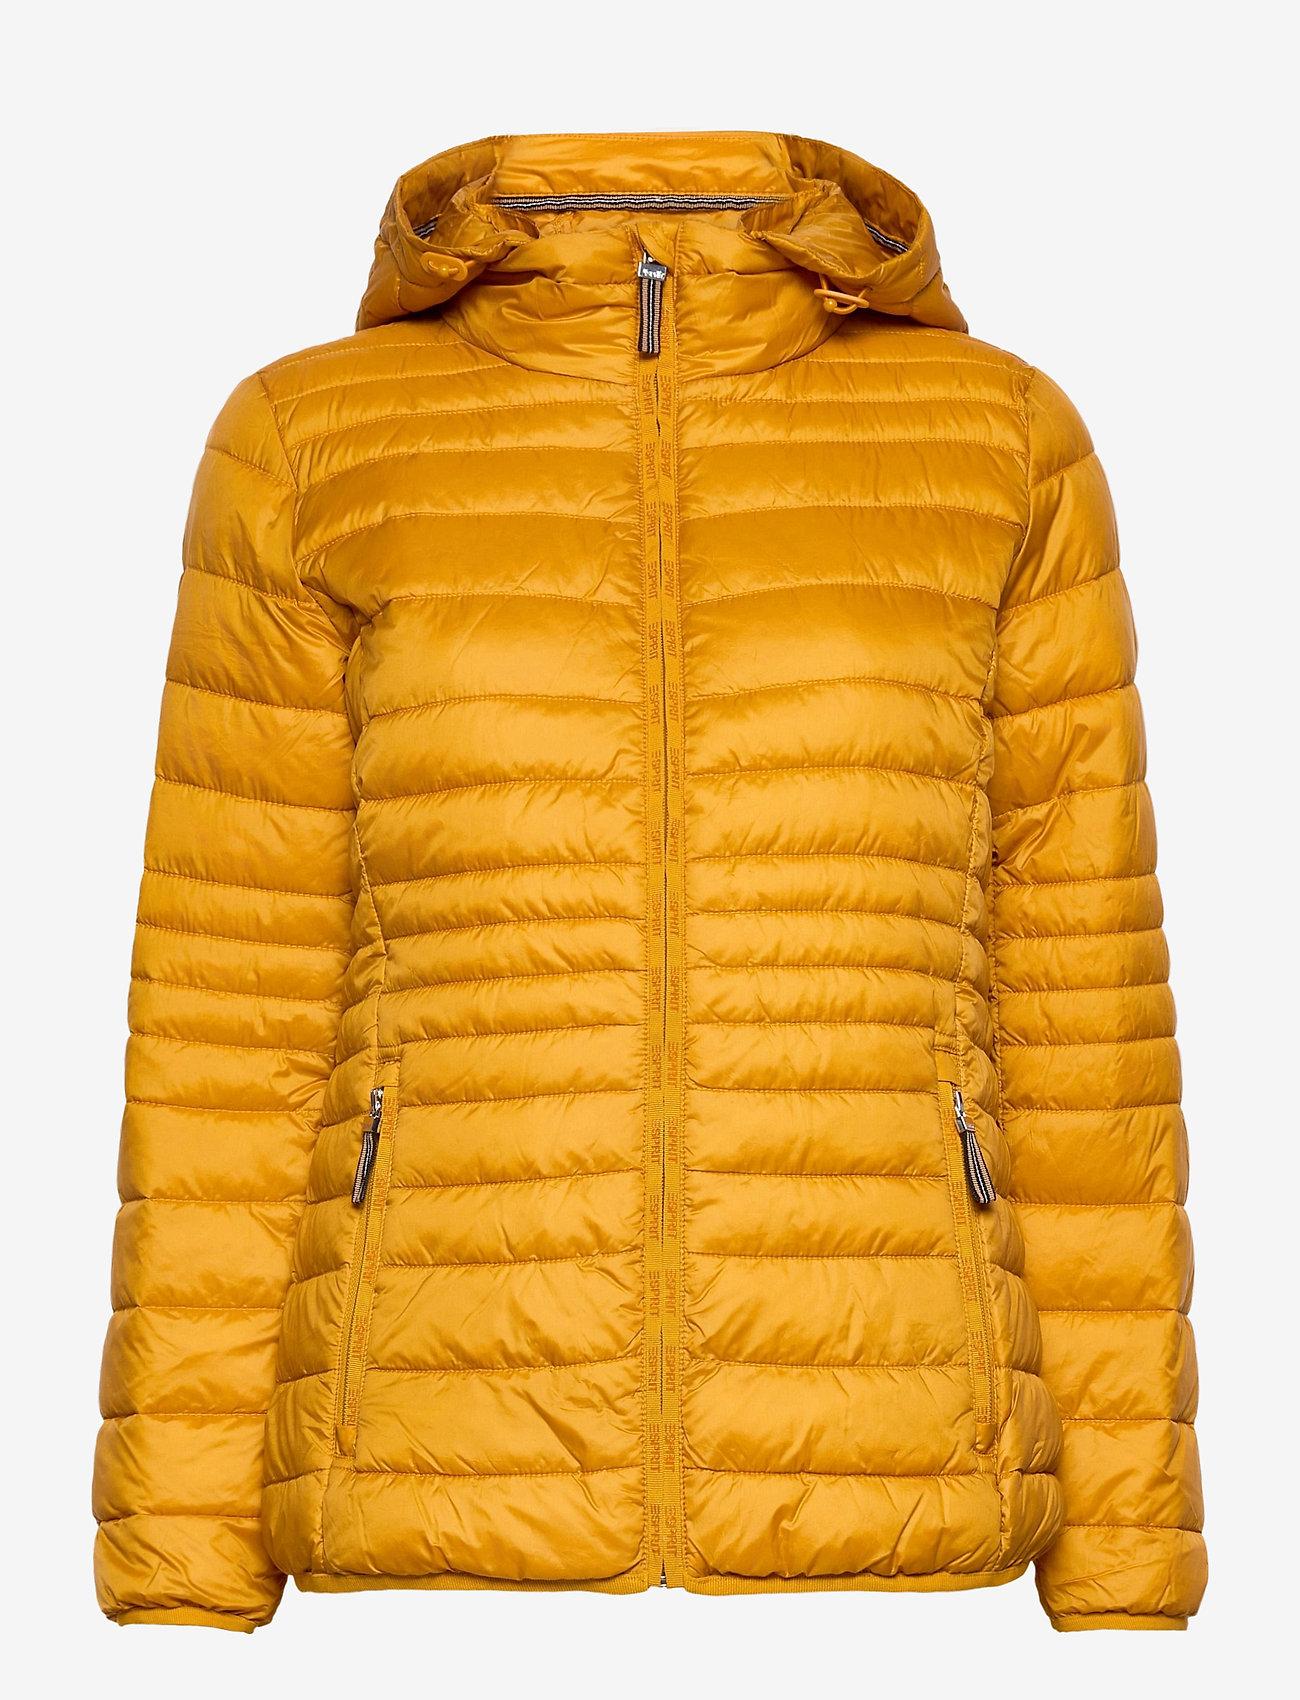 Esprit Casual - Jackets outdoor woven - doudounes - brass yellow - 1